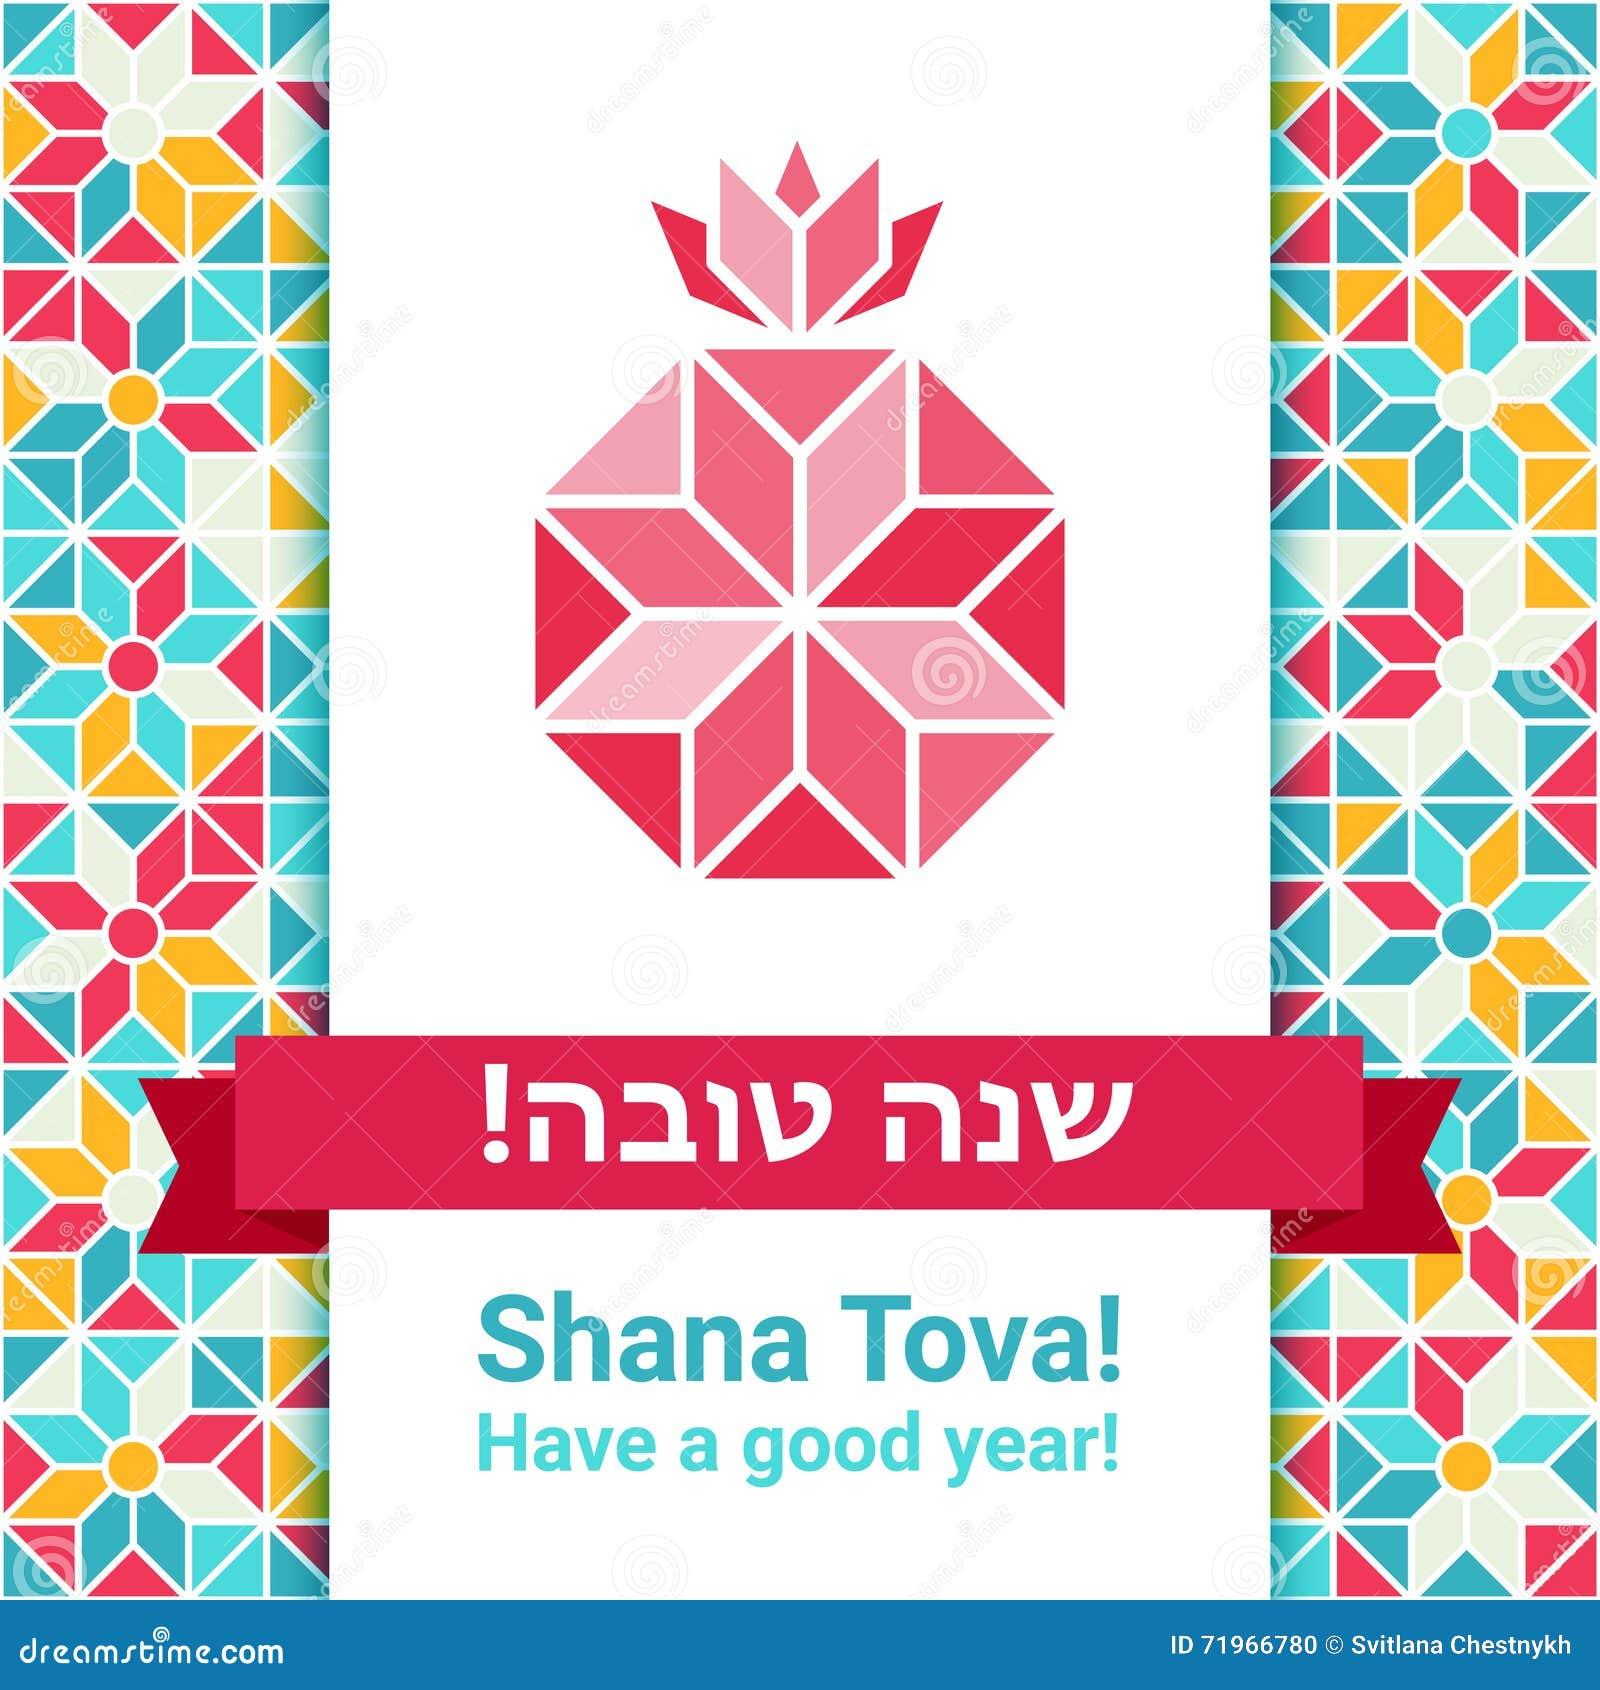 Rosh hashana greeting card shana tova stock vector rosh hashana greeting card shana tova design holiday kristyandbryce Images